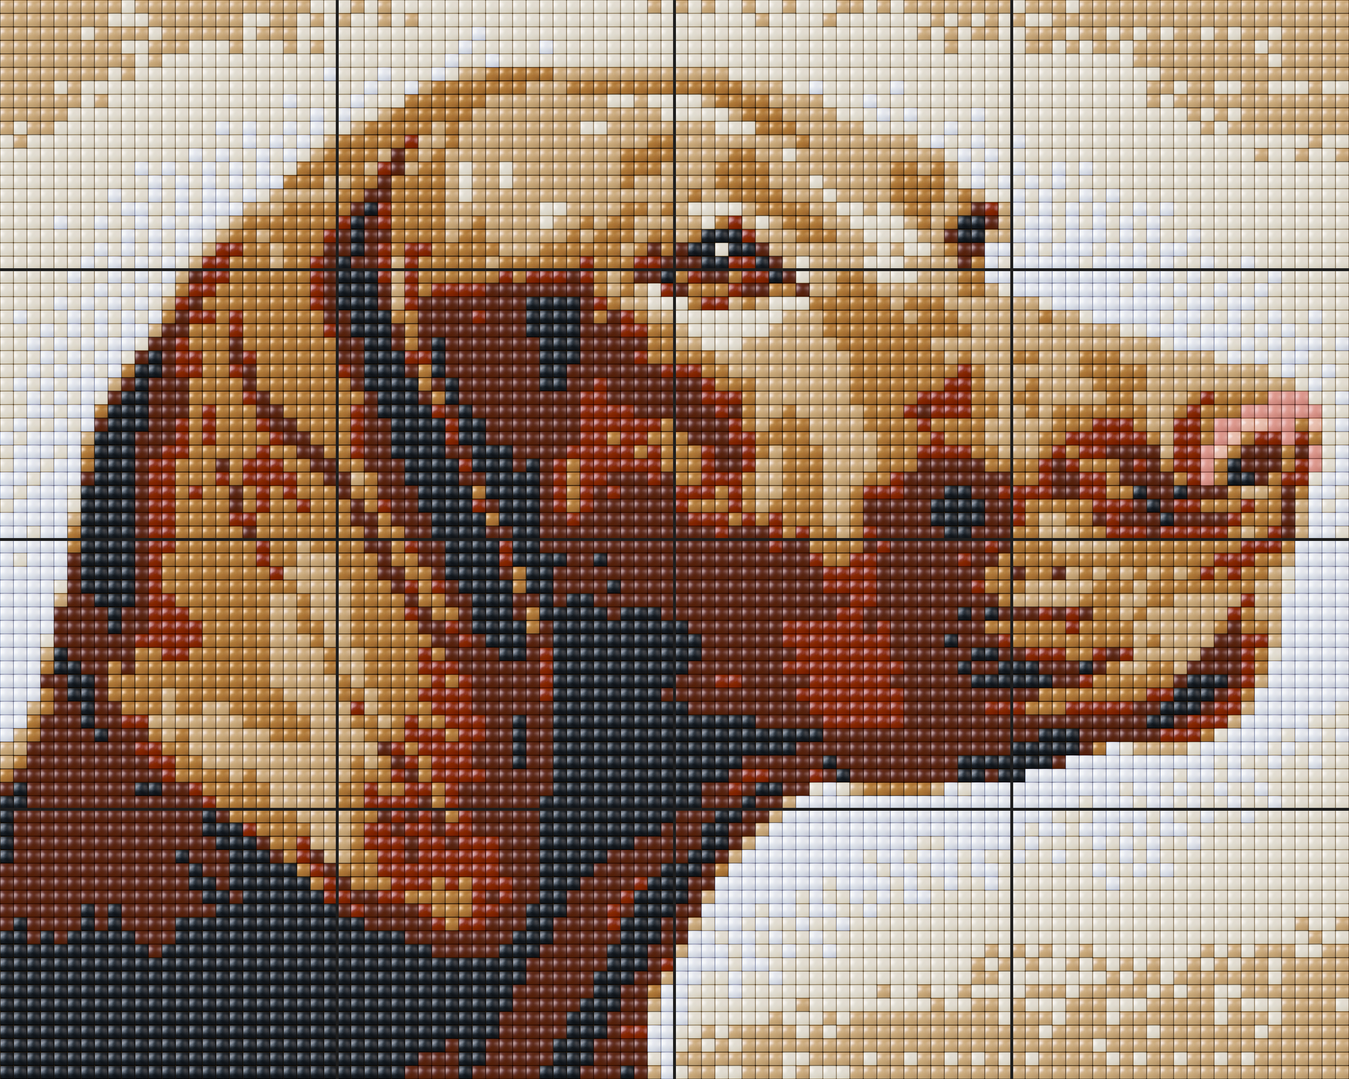 Dog_Animals_Liz_4x4L_80x100_XL.png